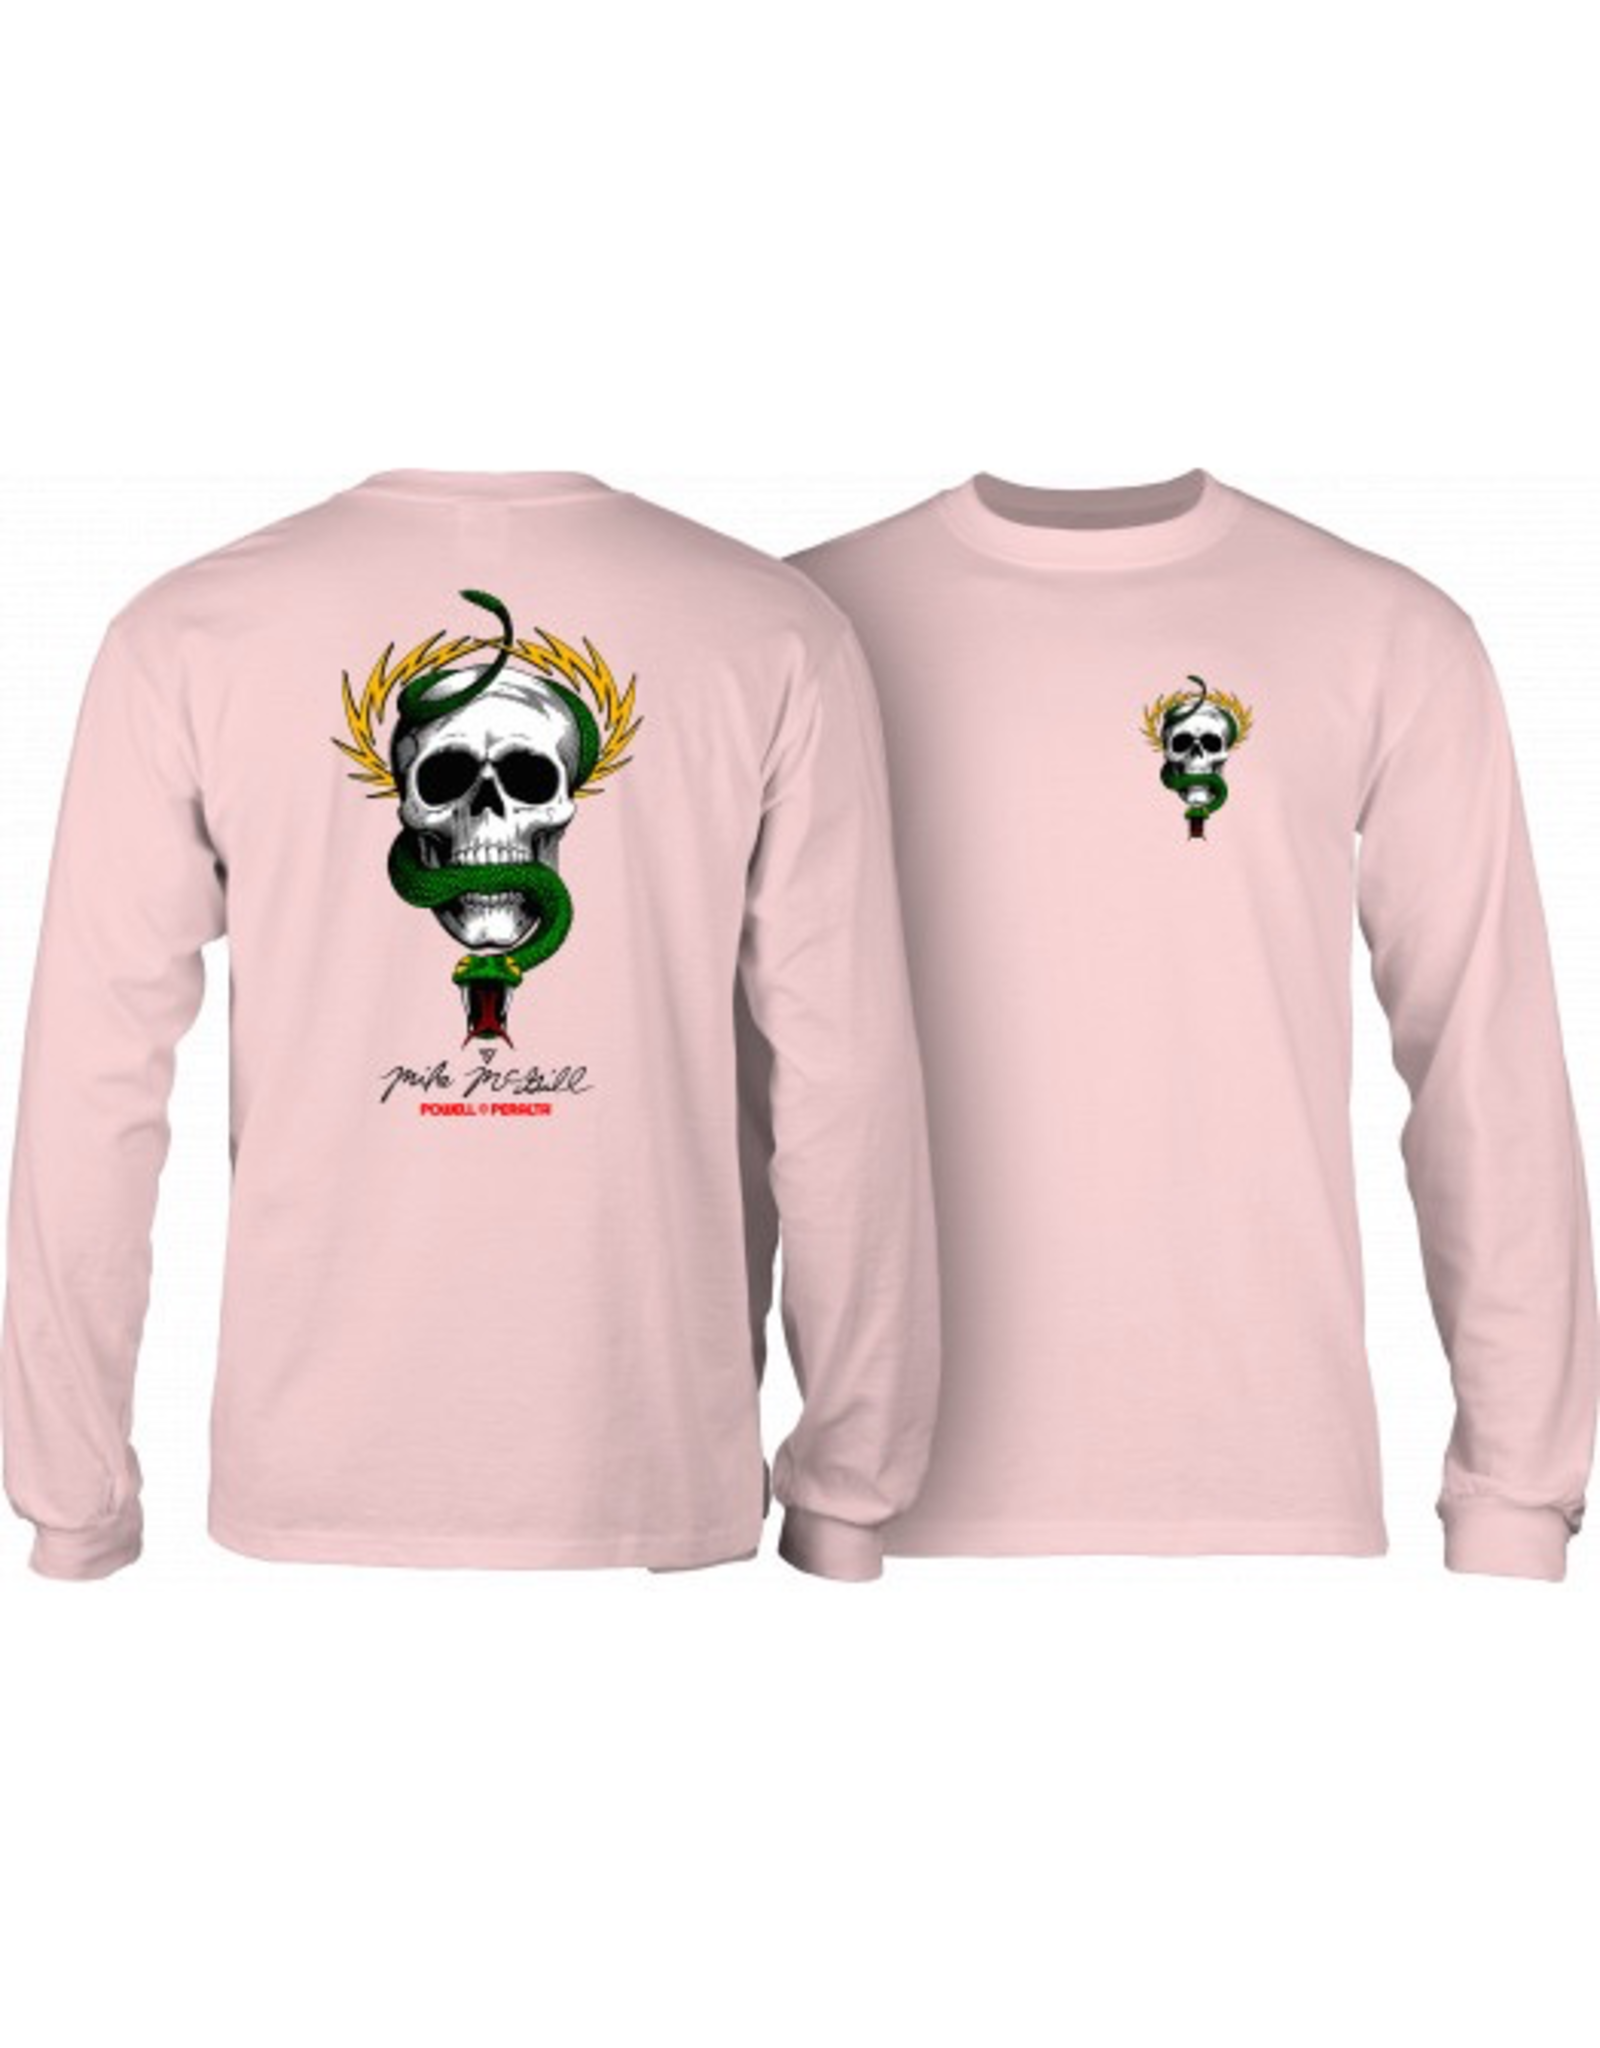 POWELL Powell Peralta Skull & Snake L/S Shirt Lt. Pink